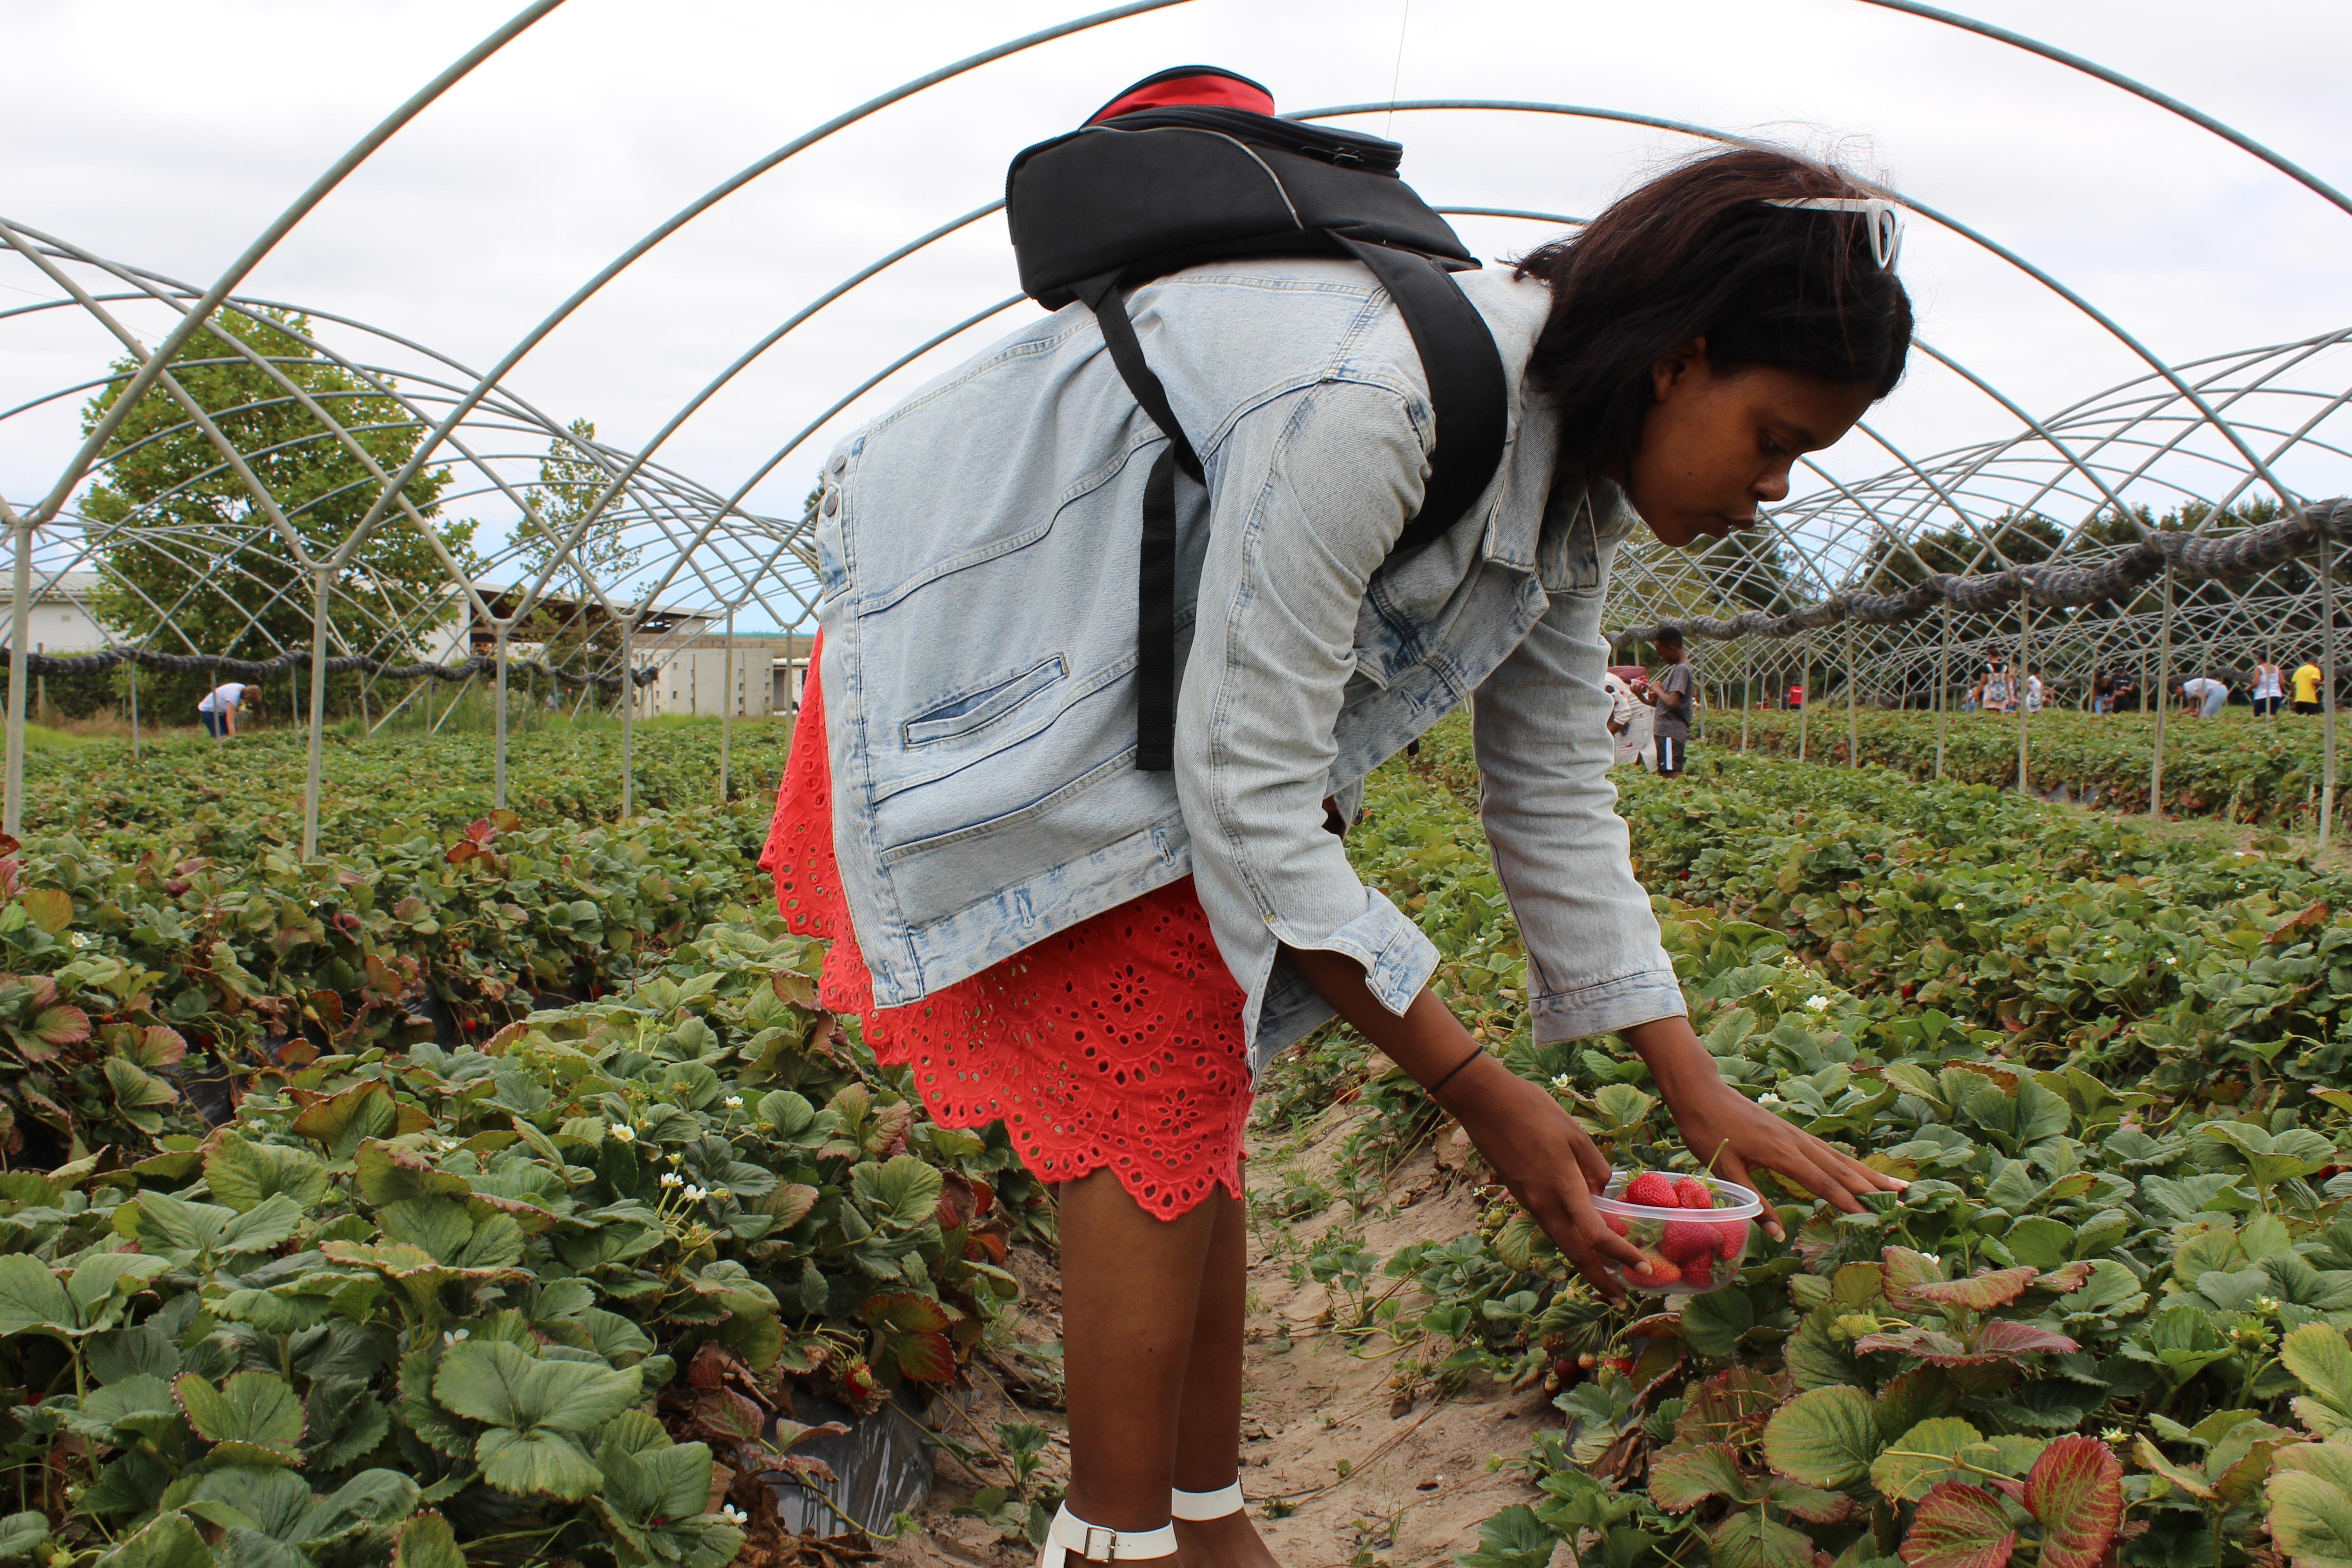 girl in orange skirt and demin jacket picking strawberries